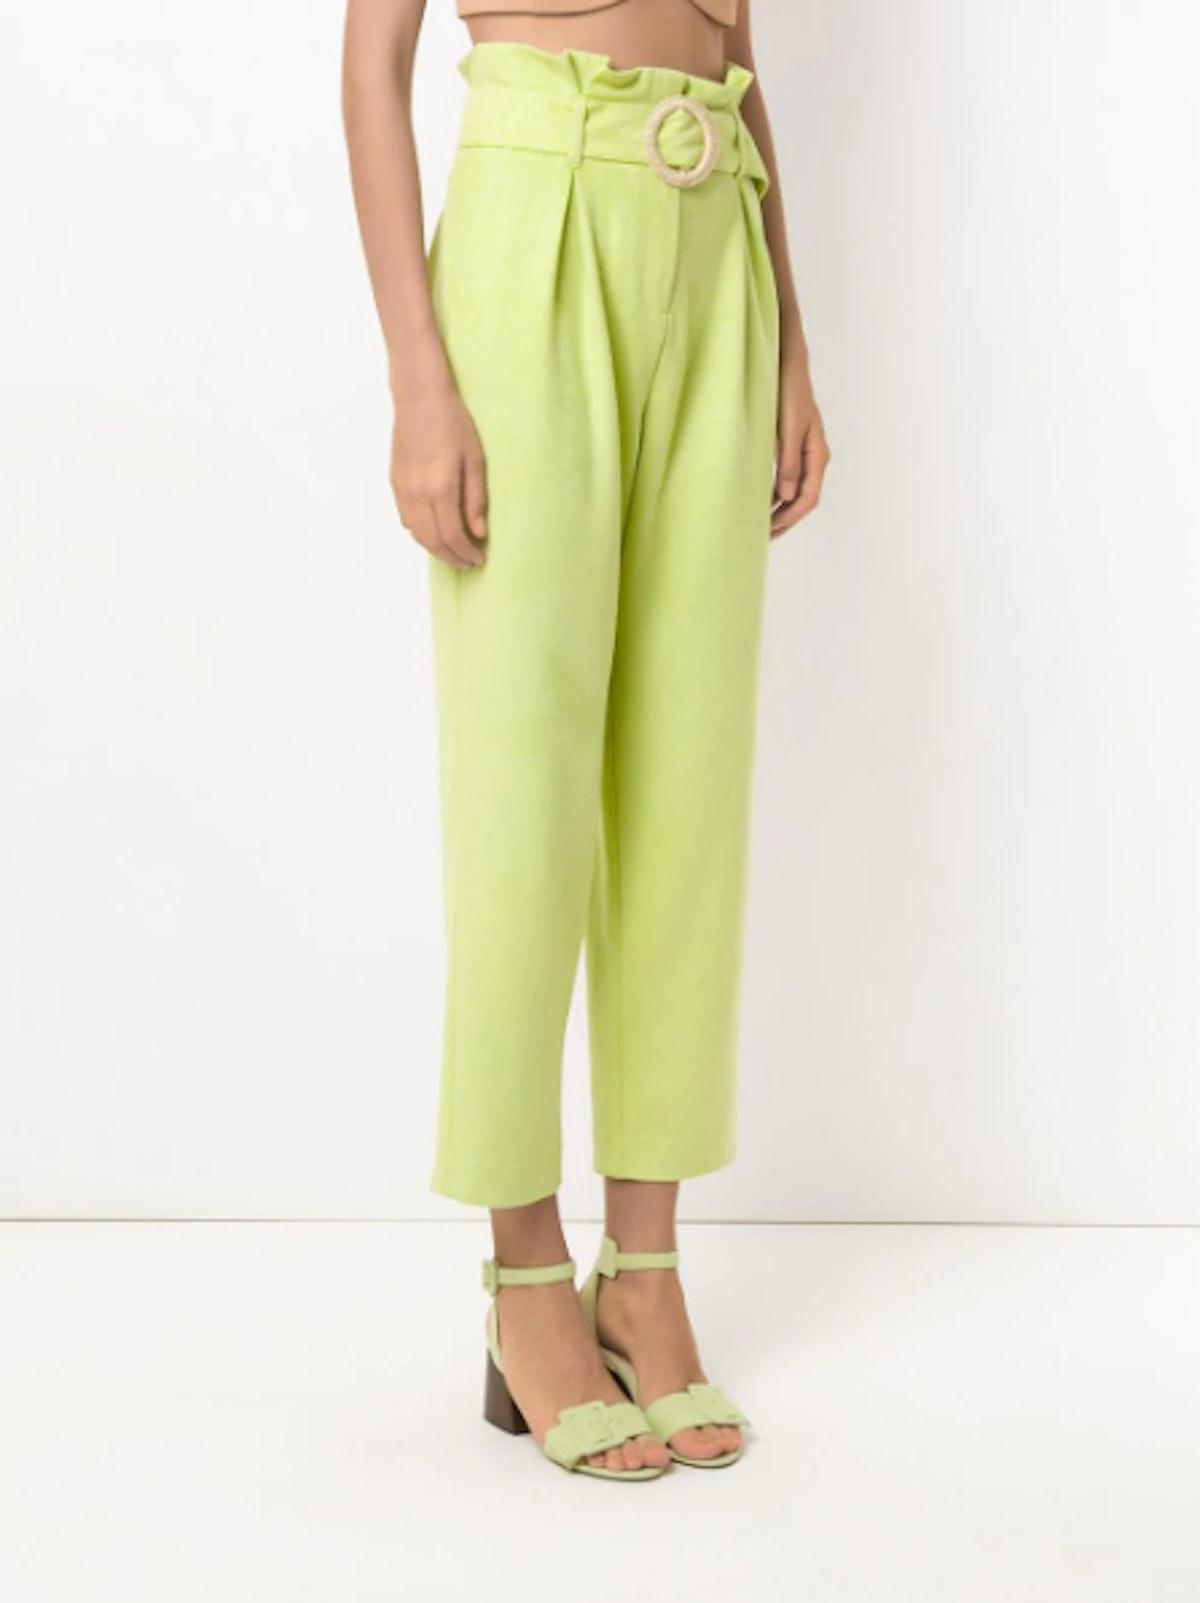 Arizona Neon Pants